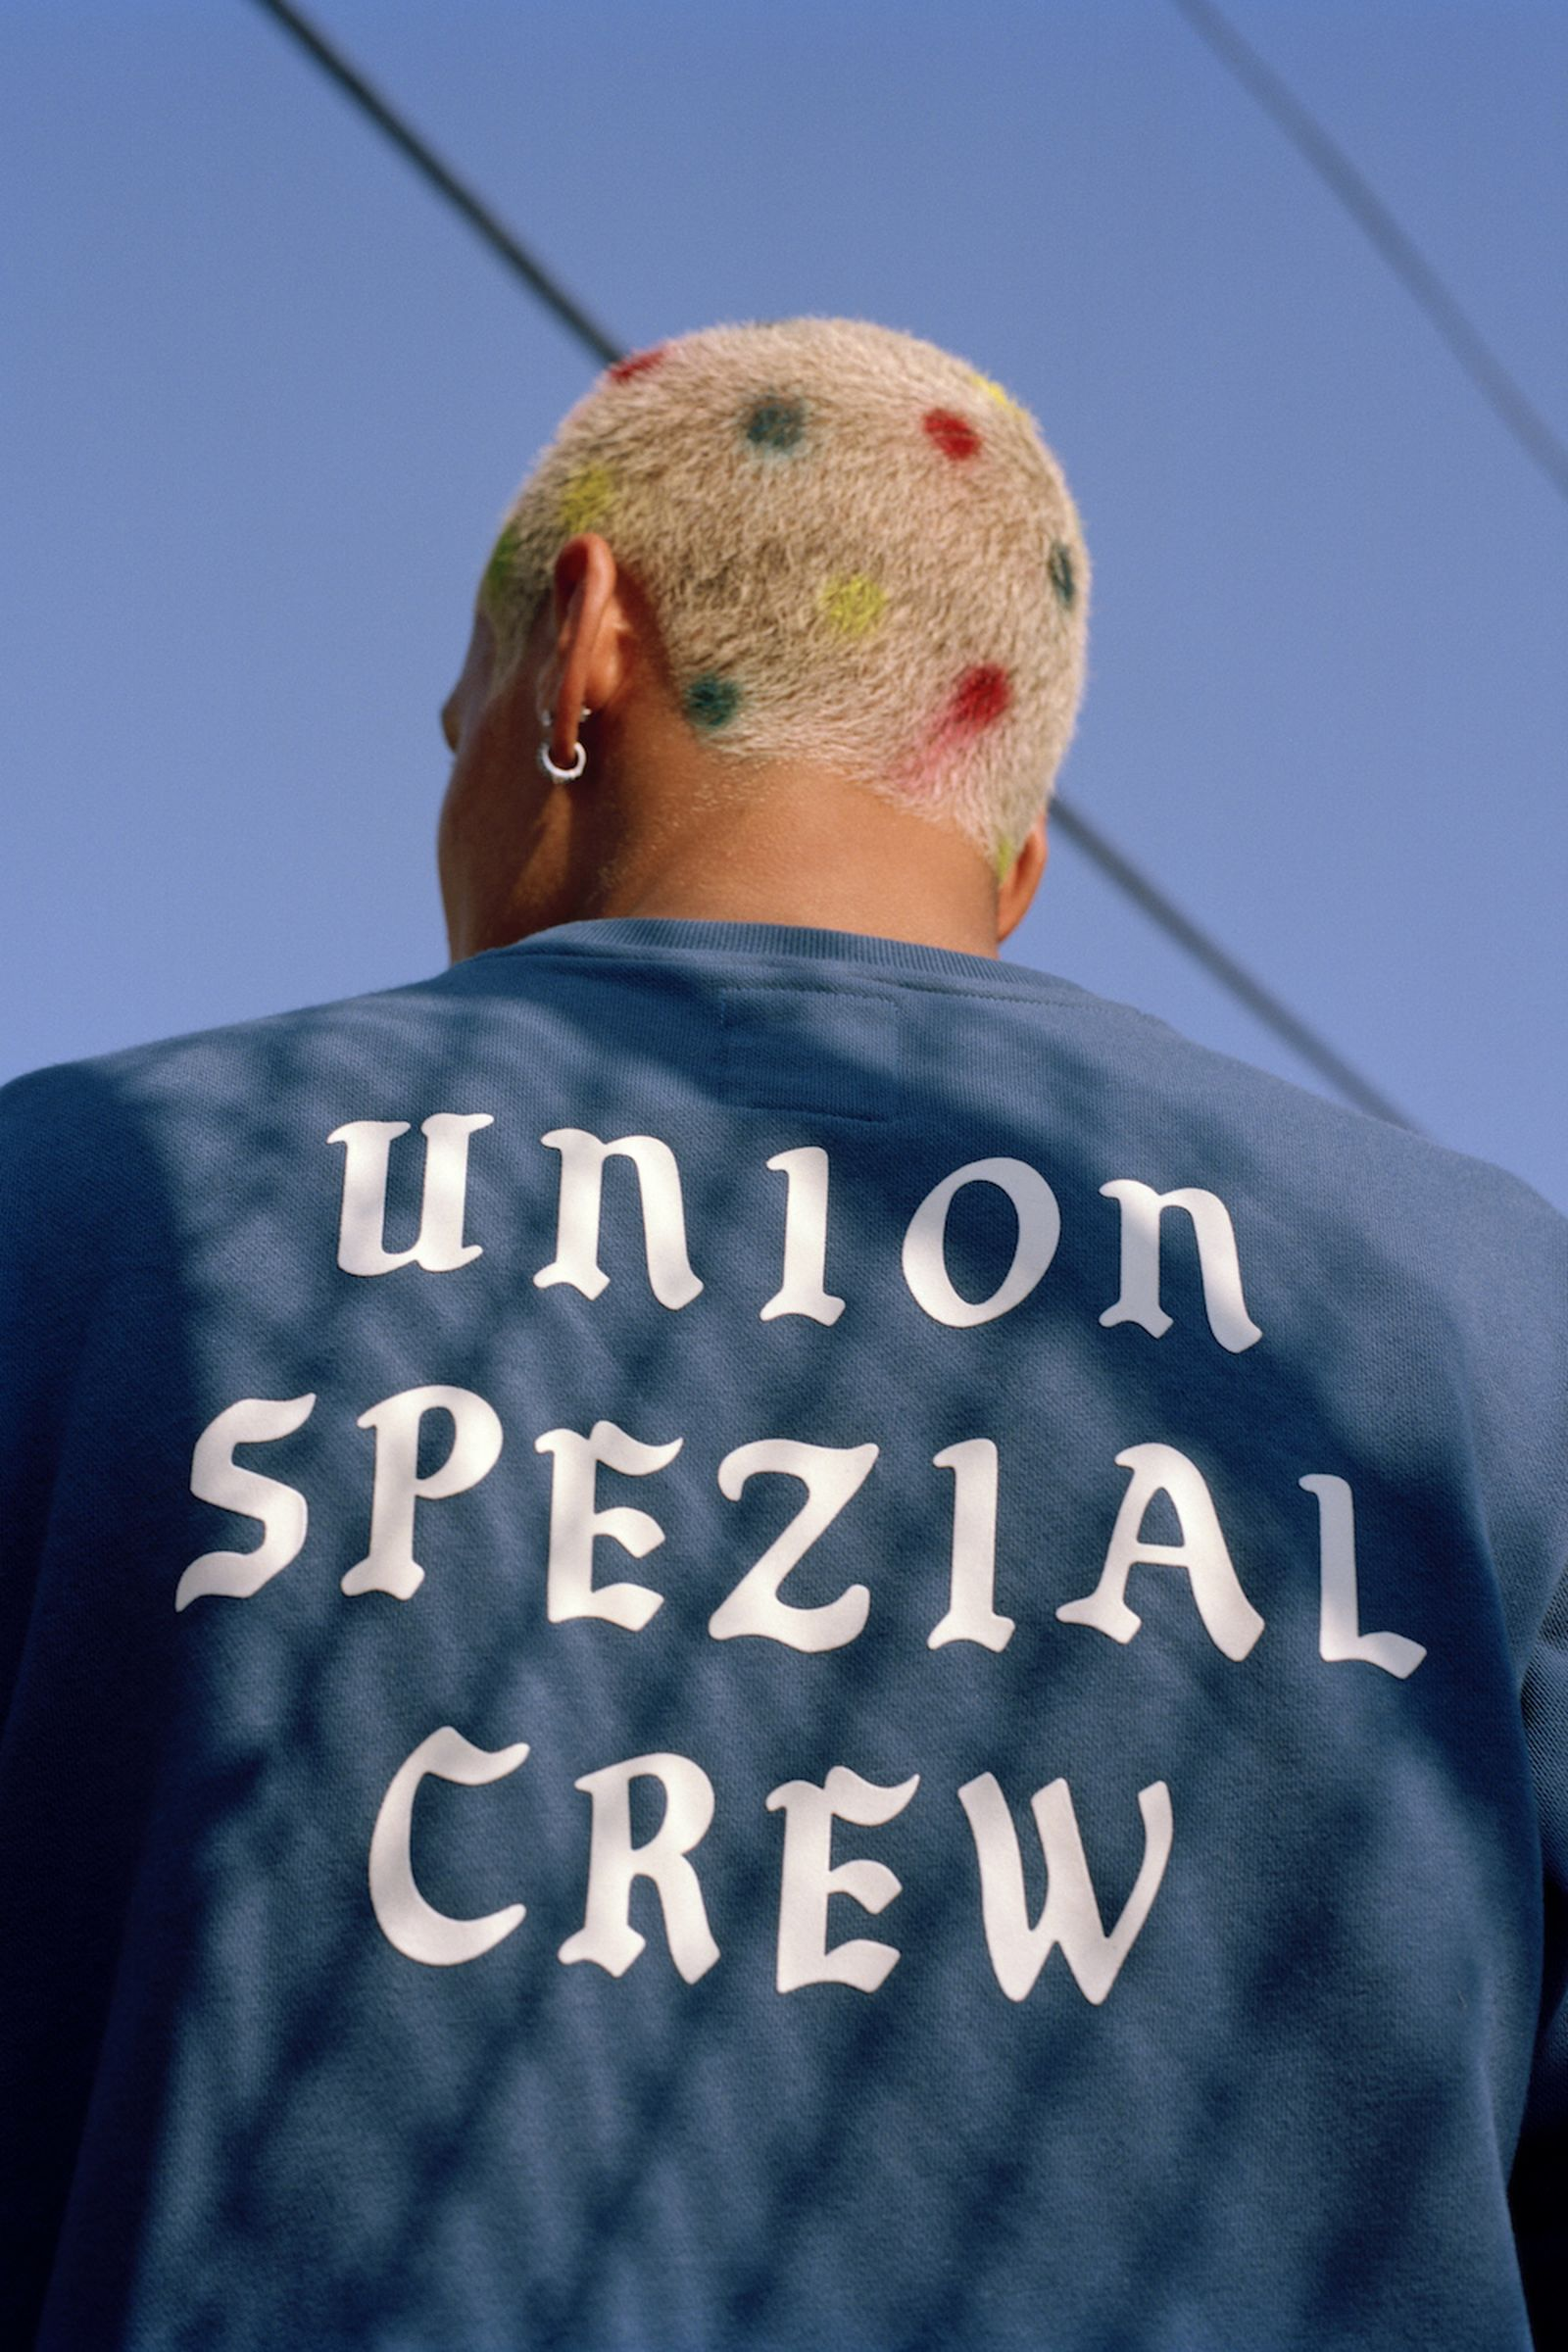 adidas spezial union fw18